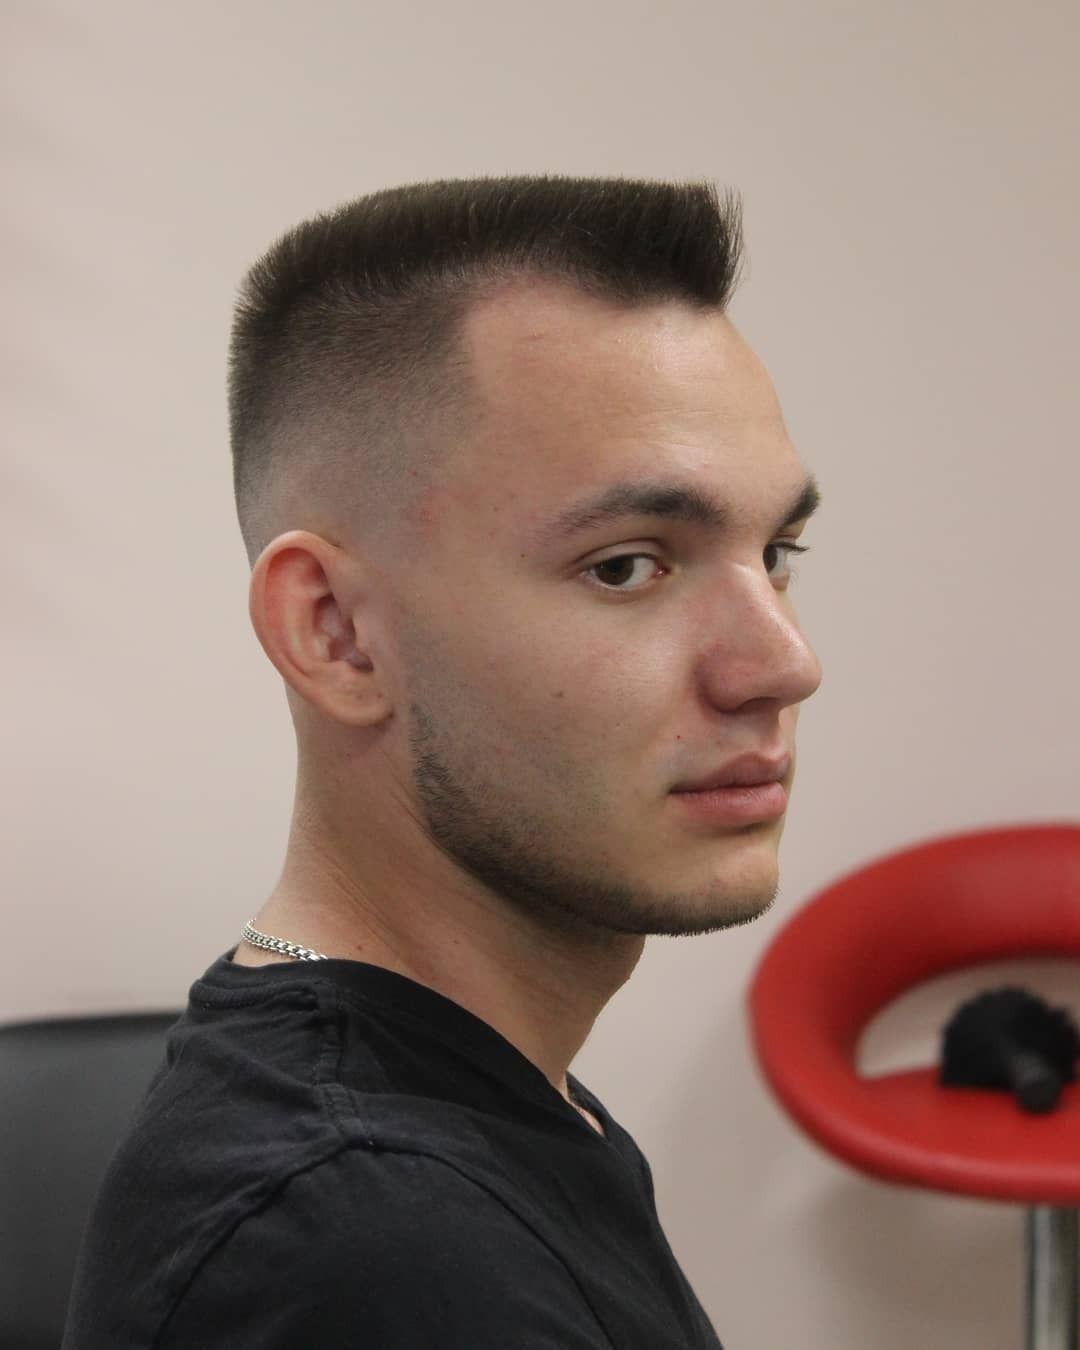 Pin On Flattop Haircut